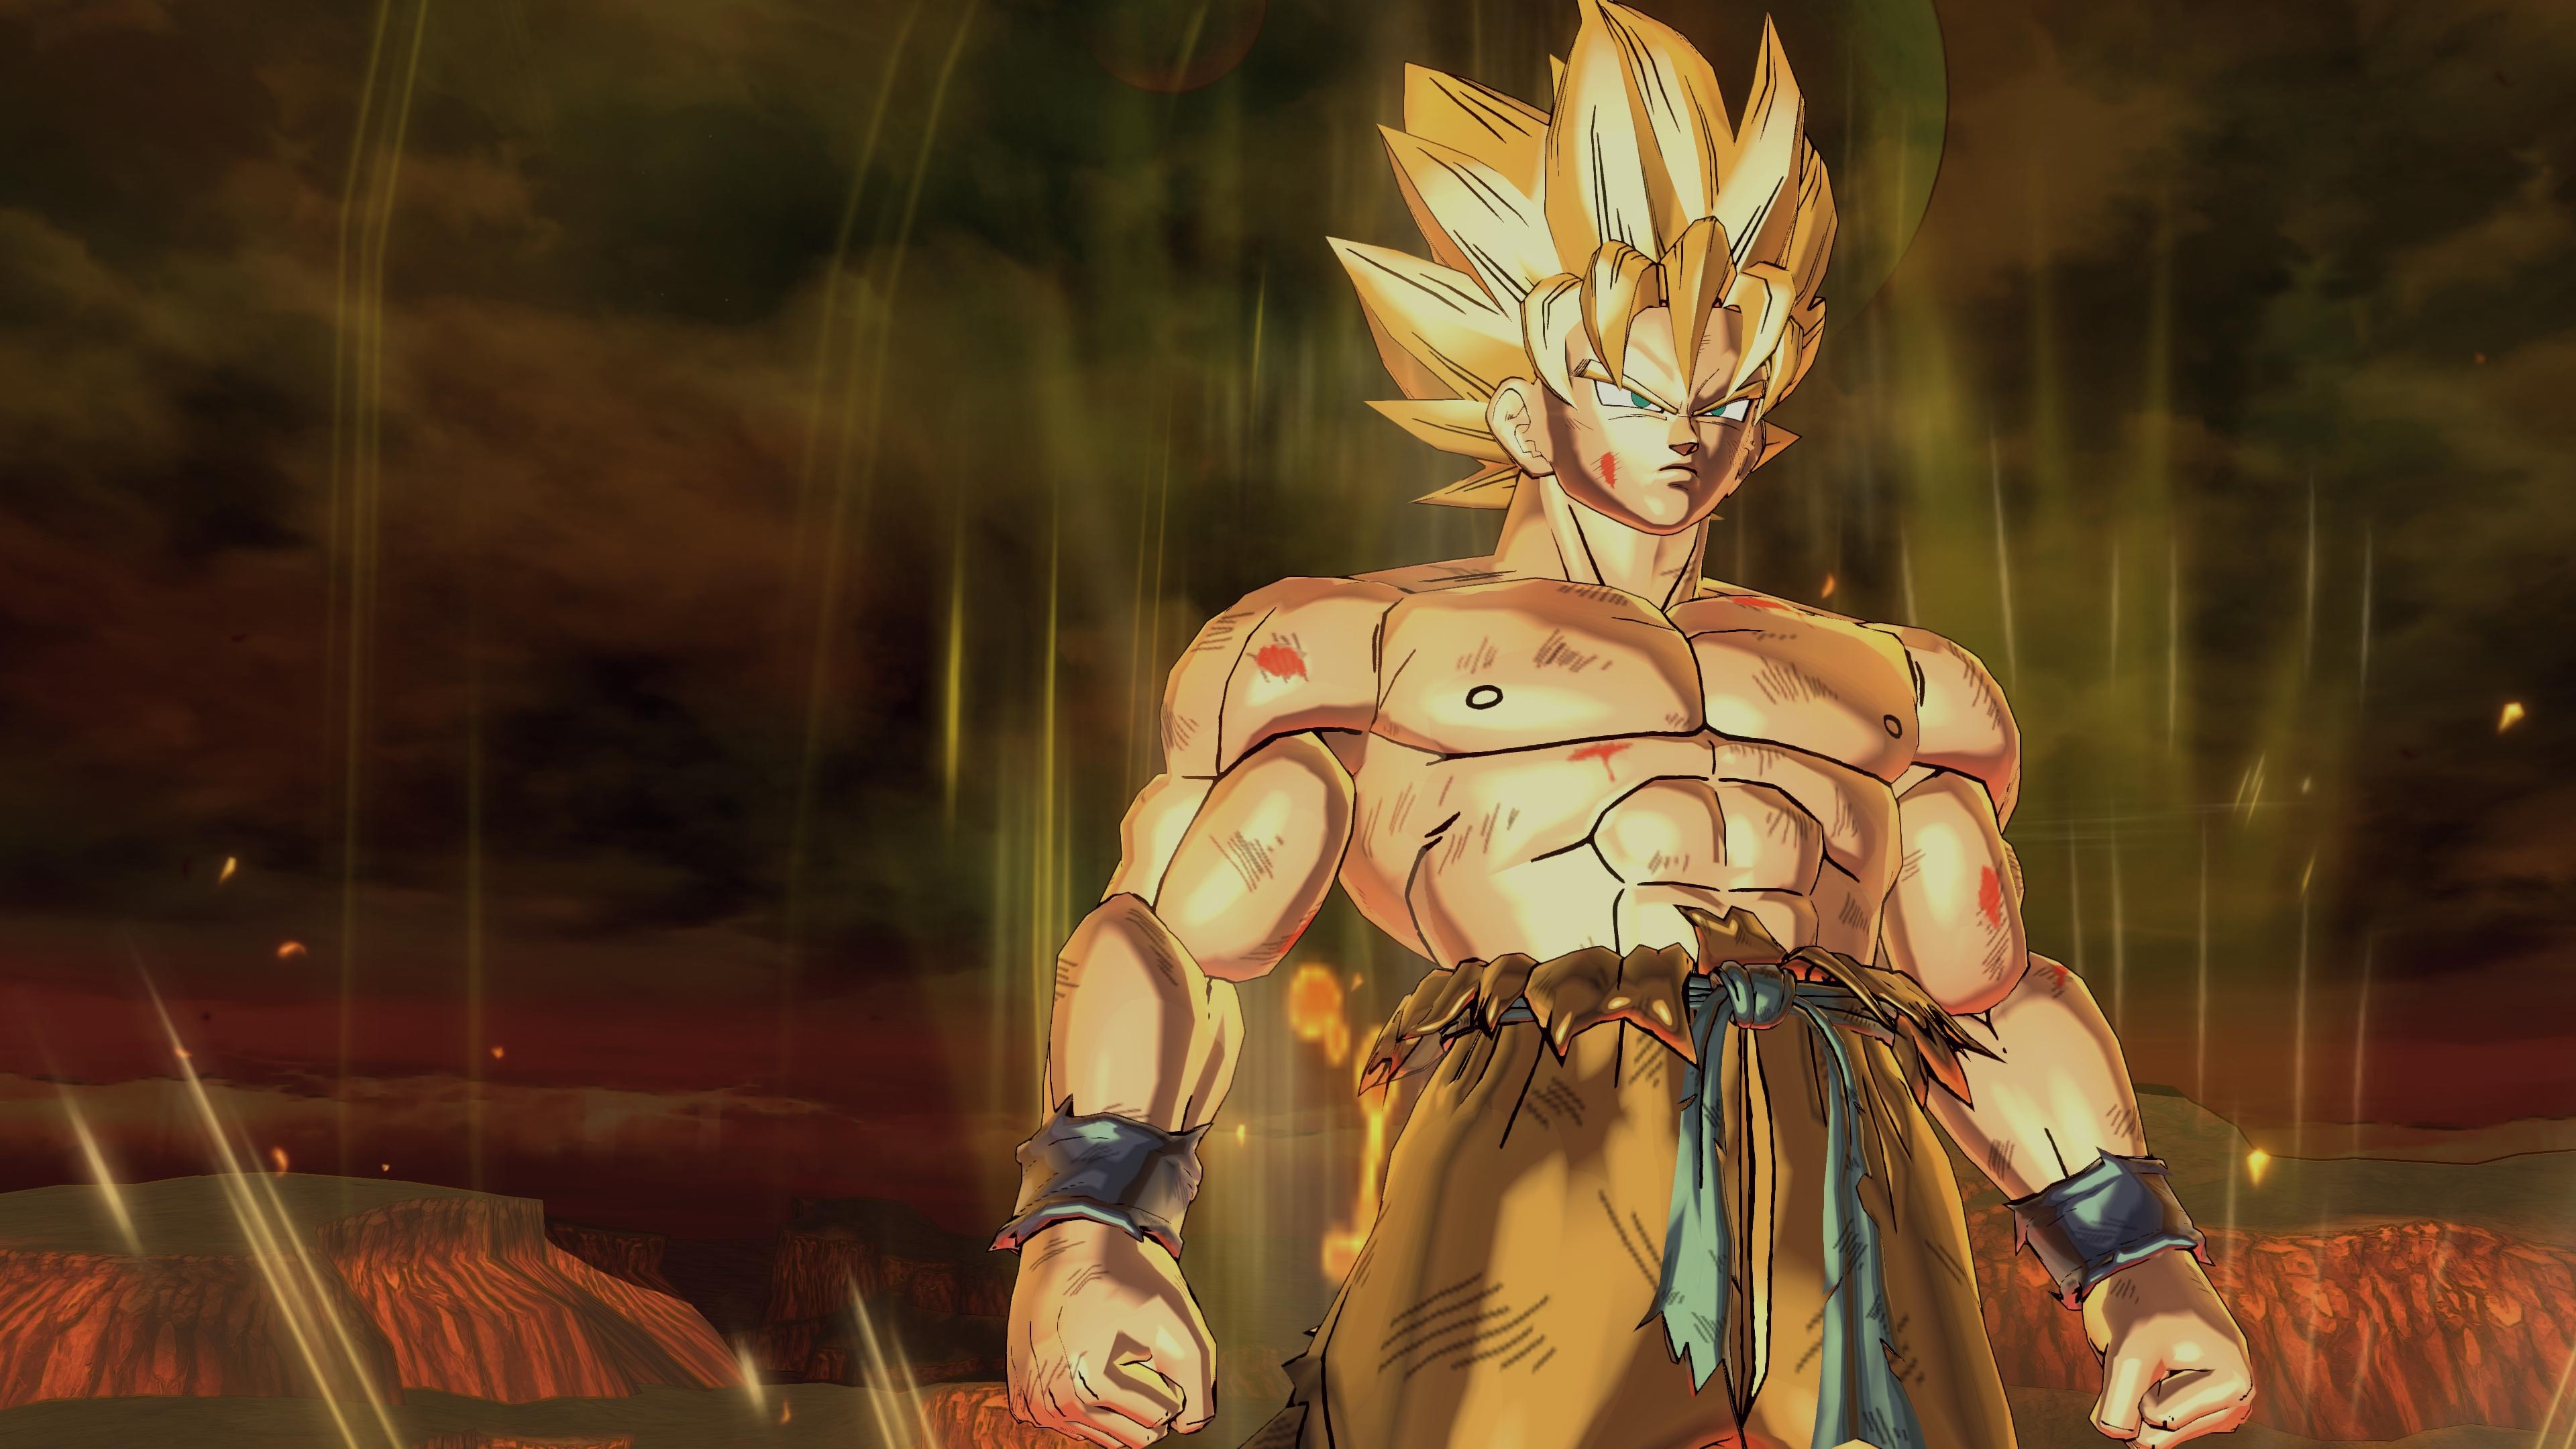 Dragon Ball Xenoverse 2 4k Ultra HD Wallpaper Background Image 3840x2160